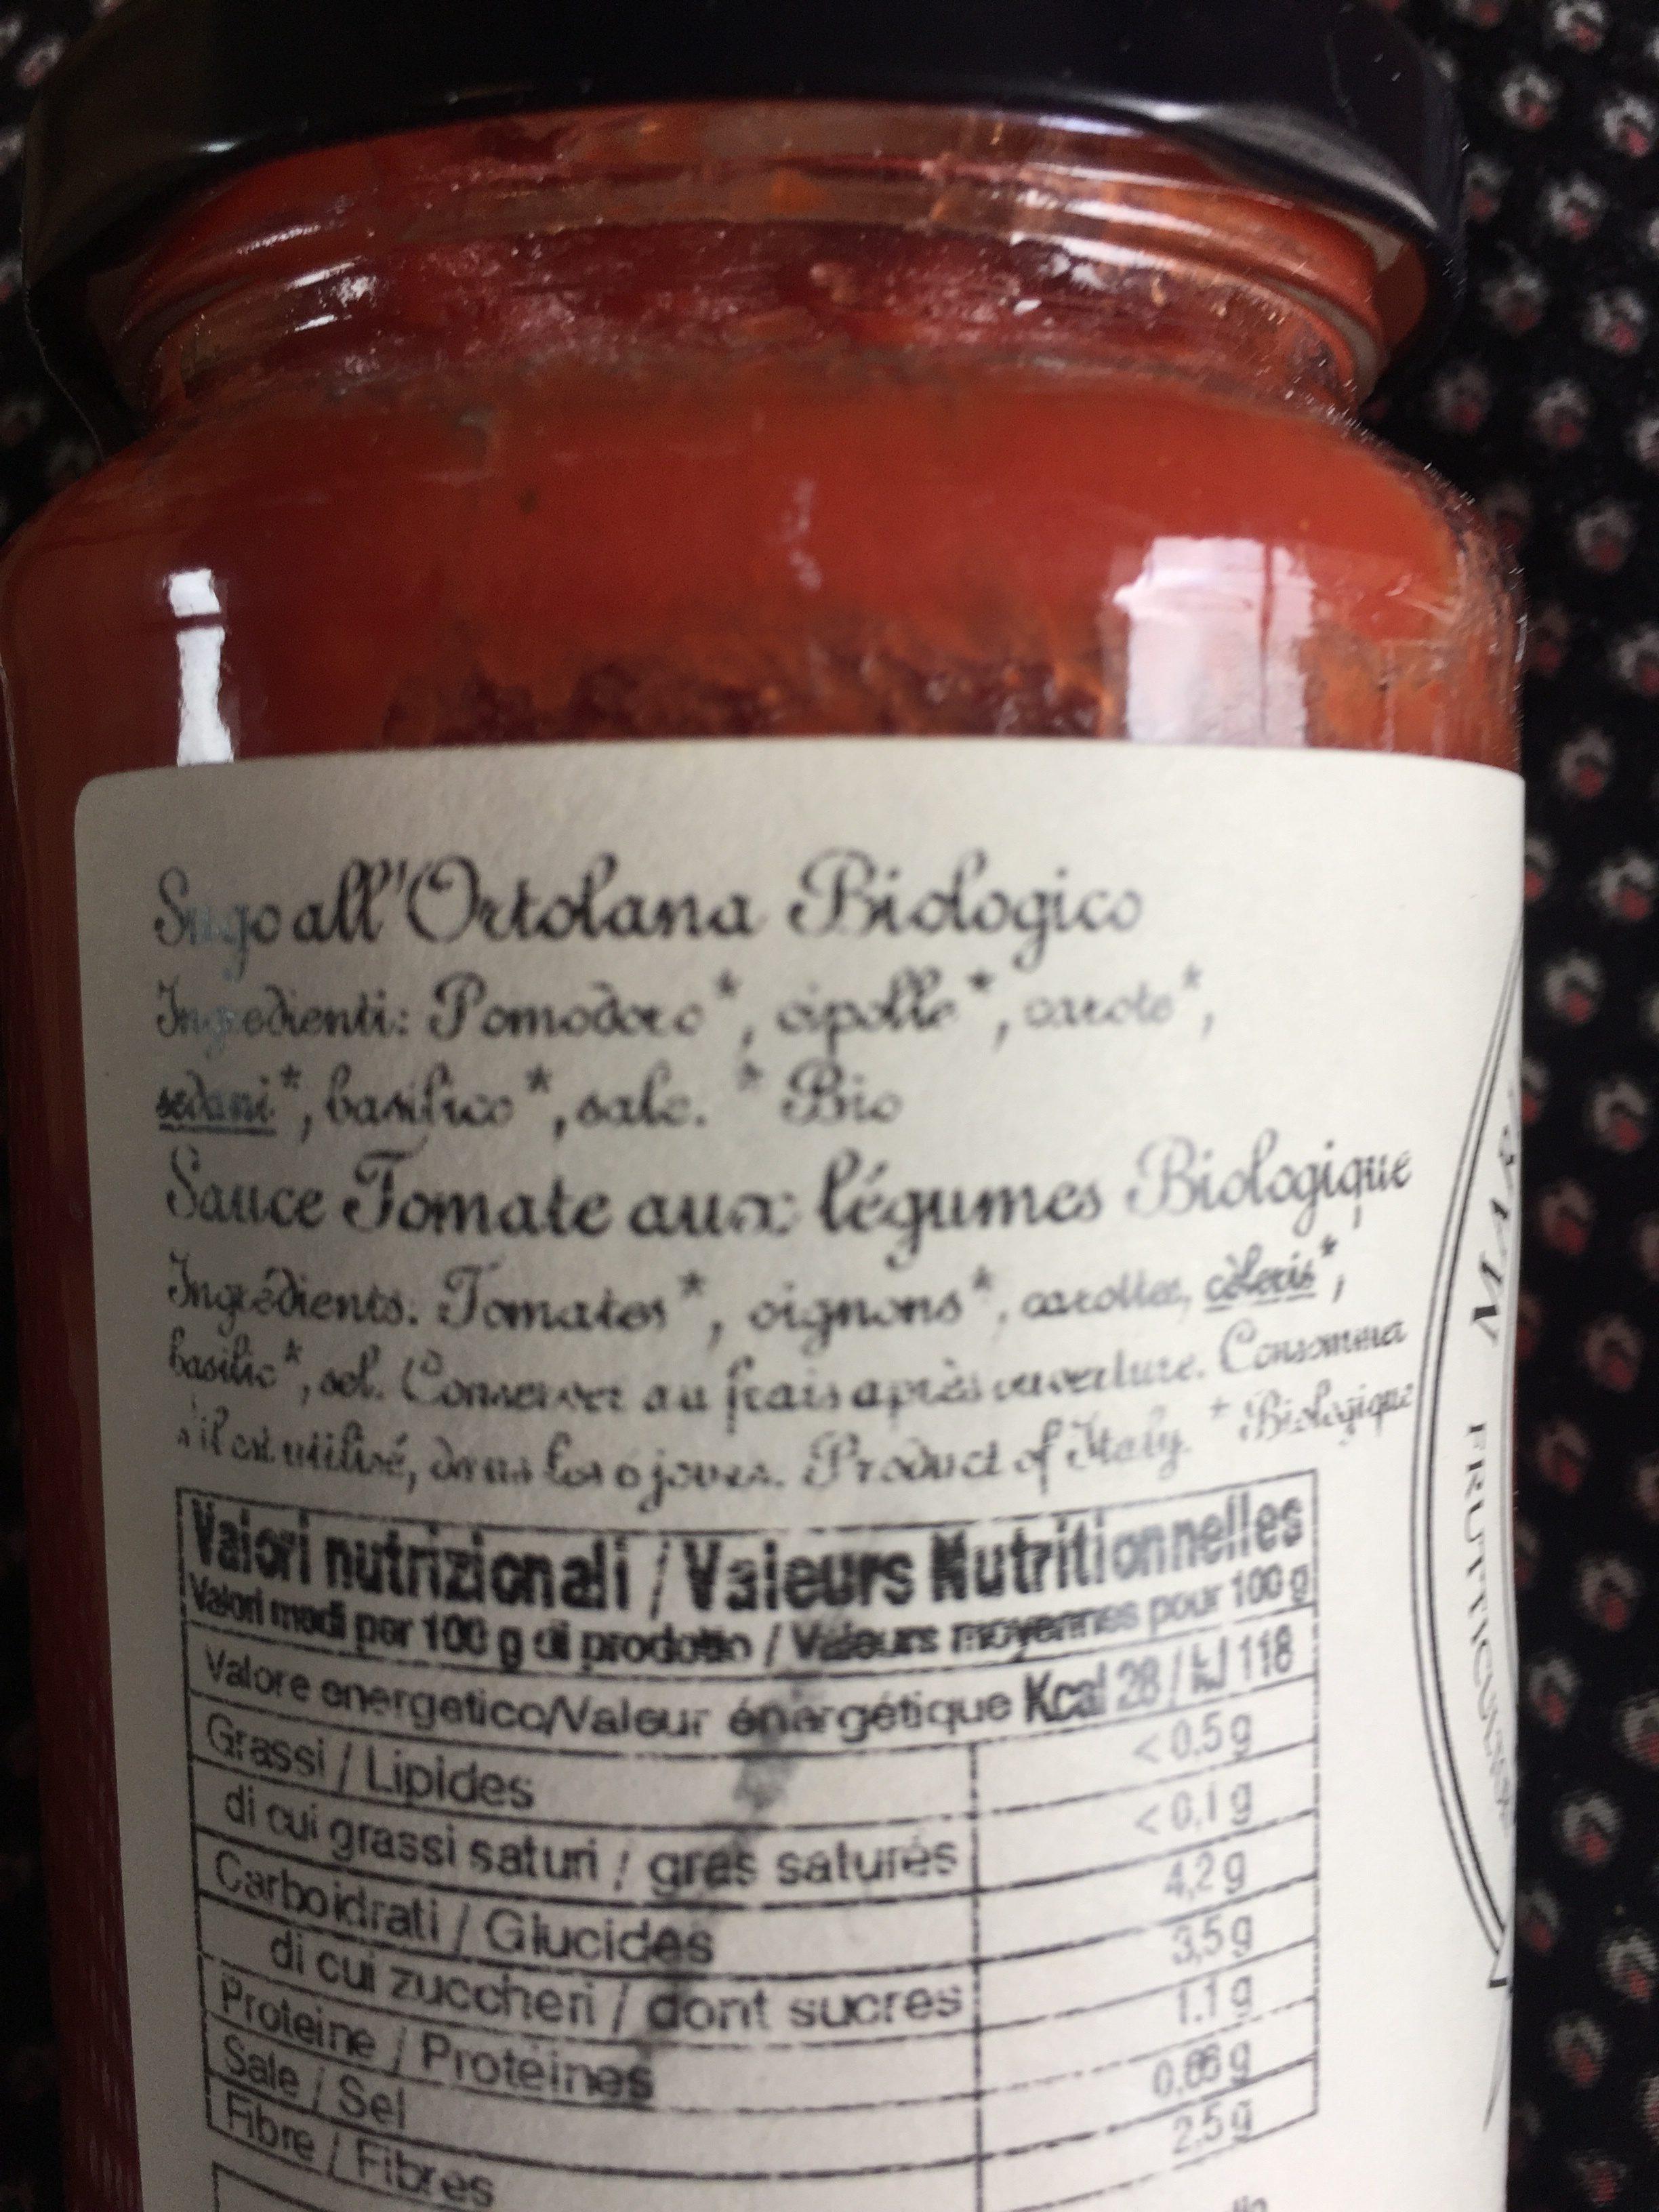 Sugo all ortolana bio - Ingredients